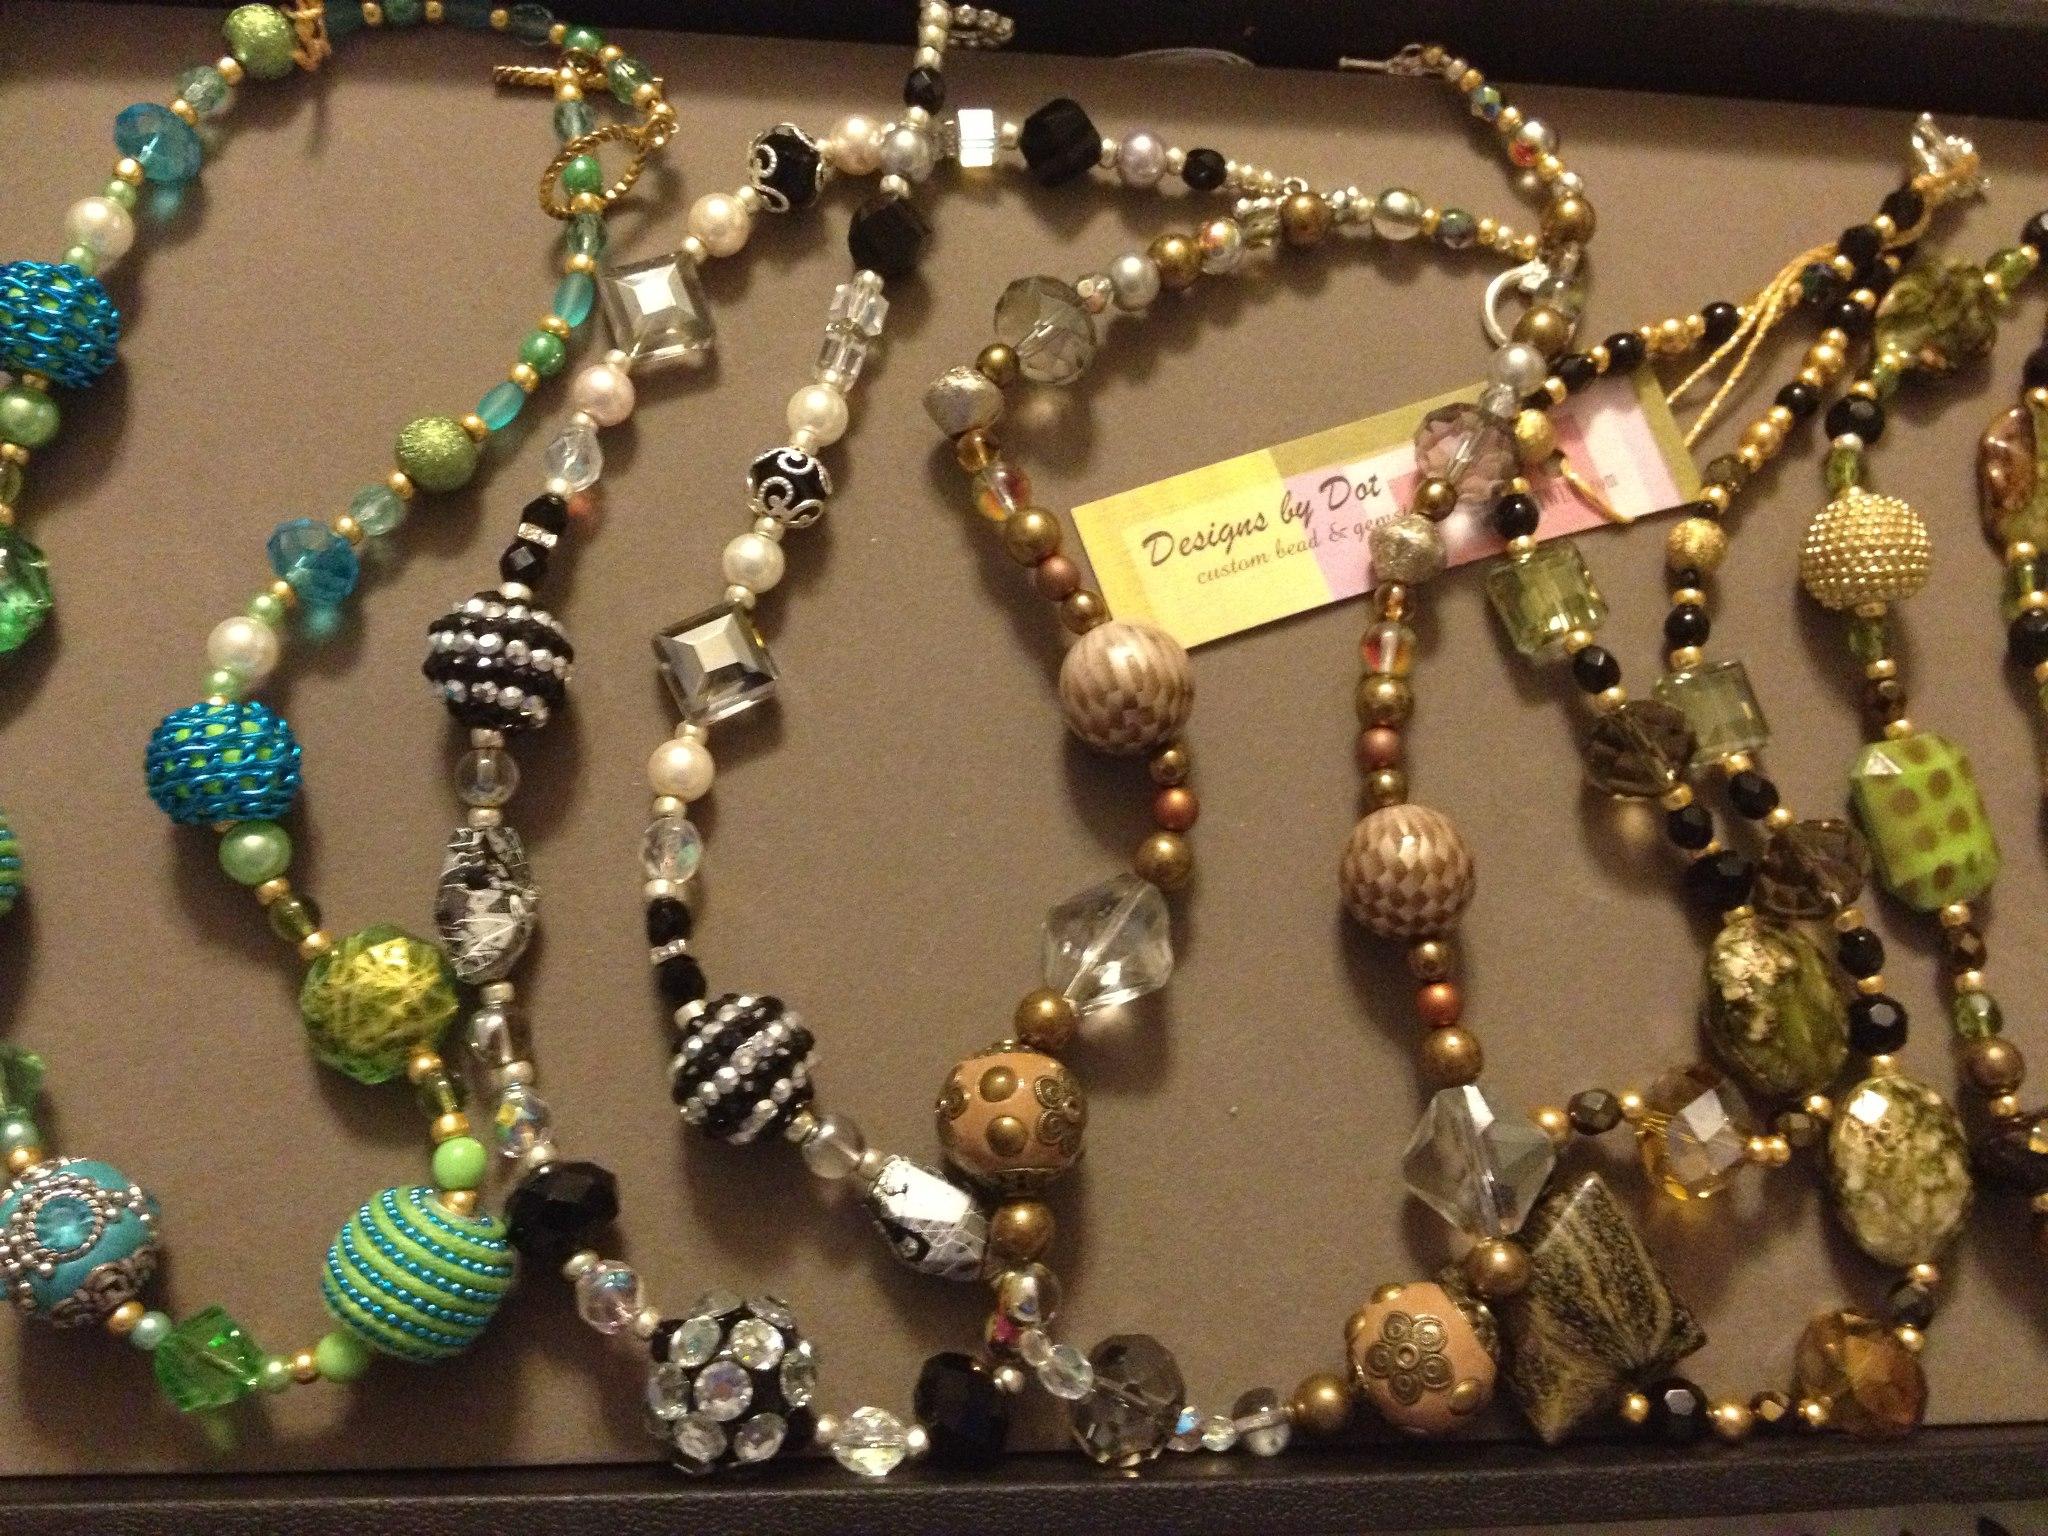 Sharing My Jewelry